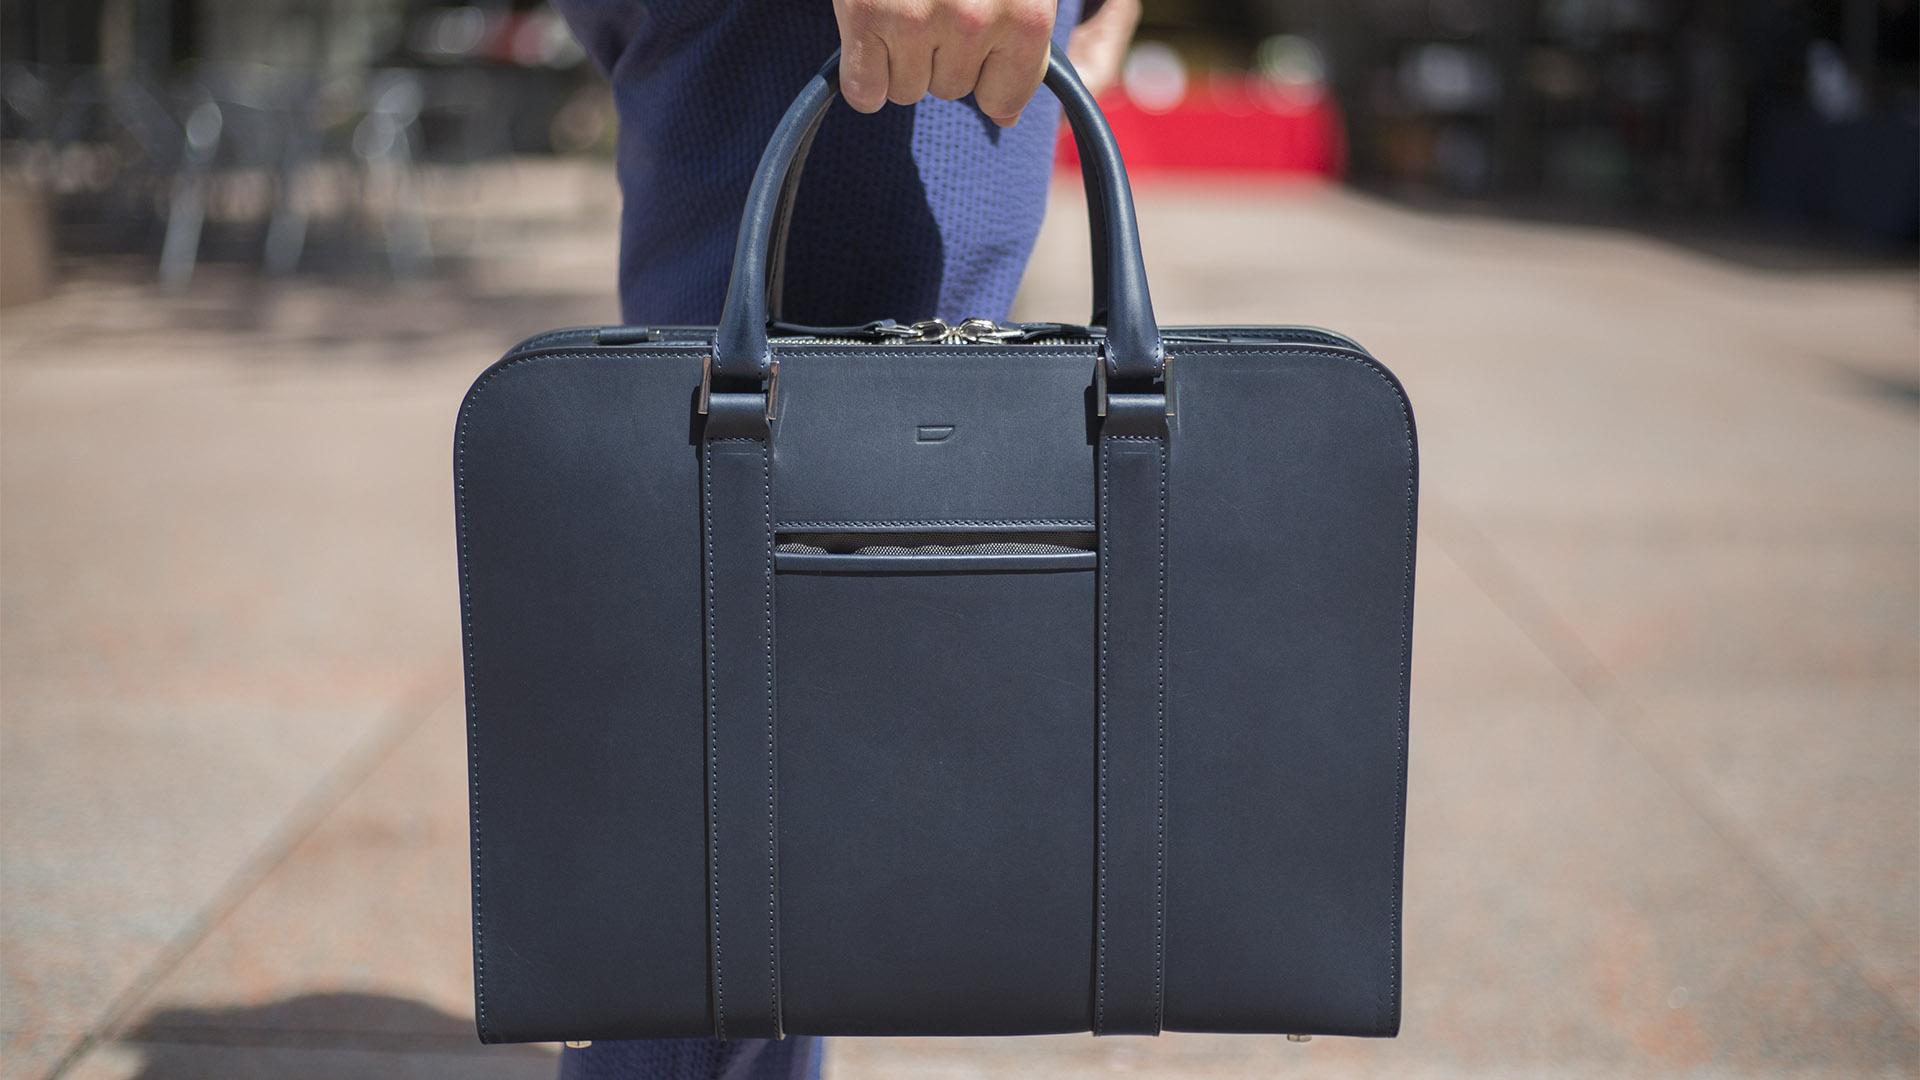 The Carl Friedrik Bag Review - The Fine Young Gentleman 8fe4e098a2abb